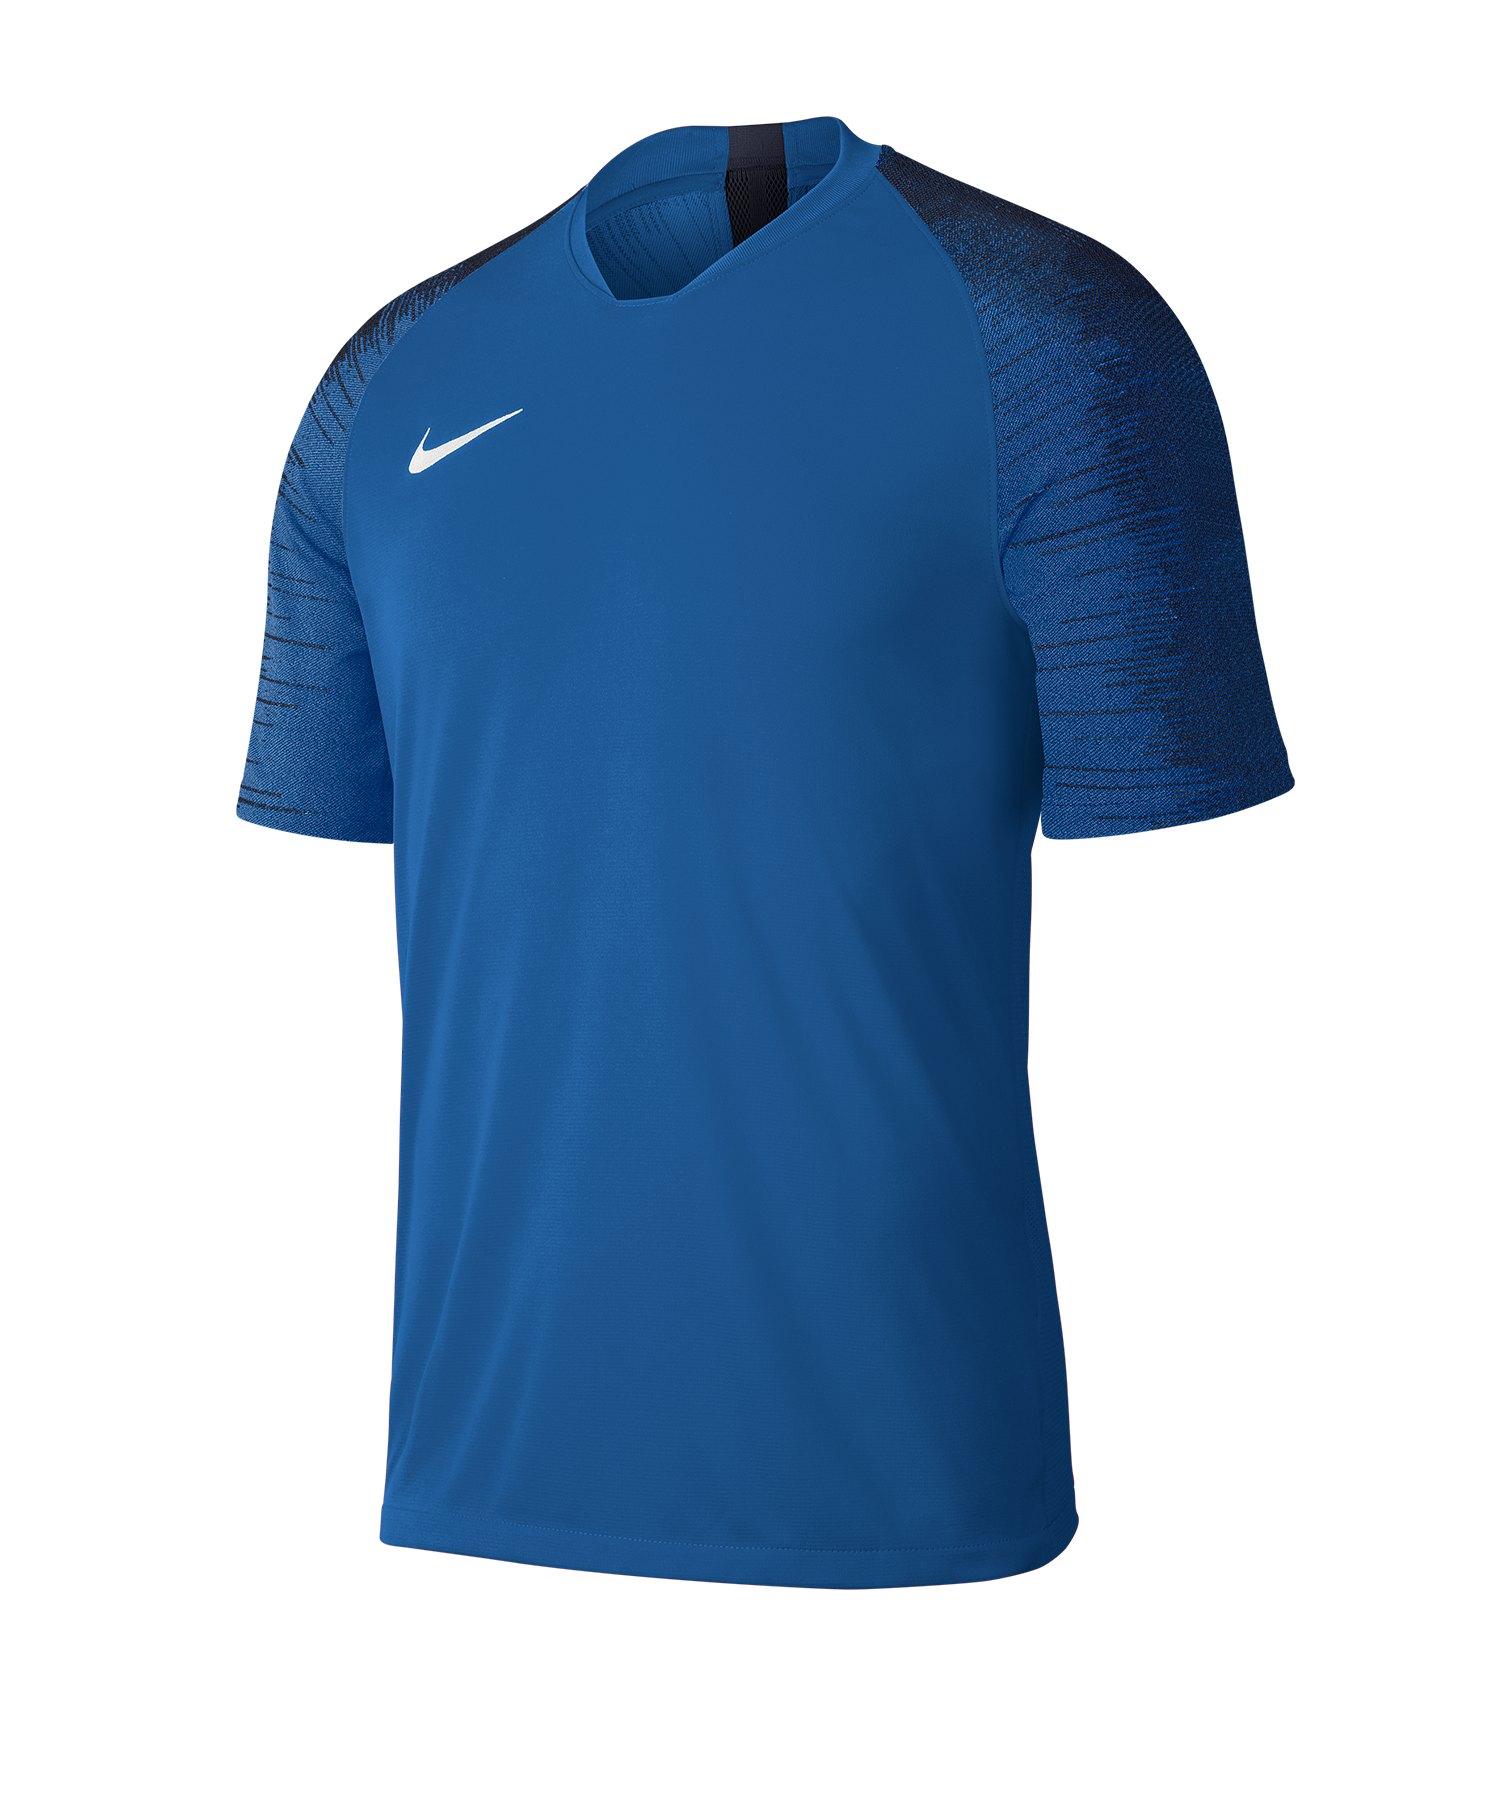 info for a8dd6 4703c Nike Strike Trikot Blau F463